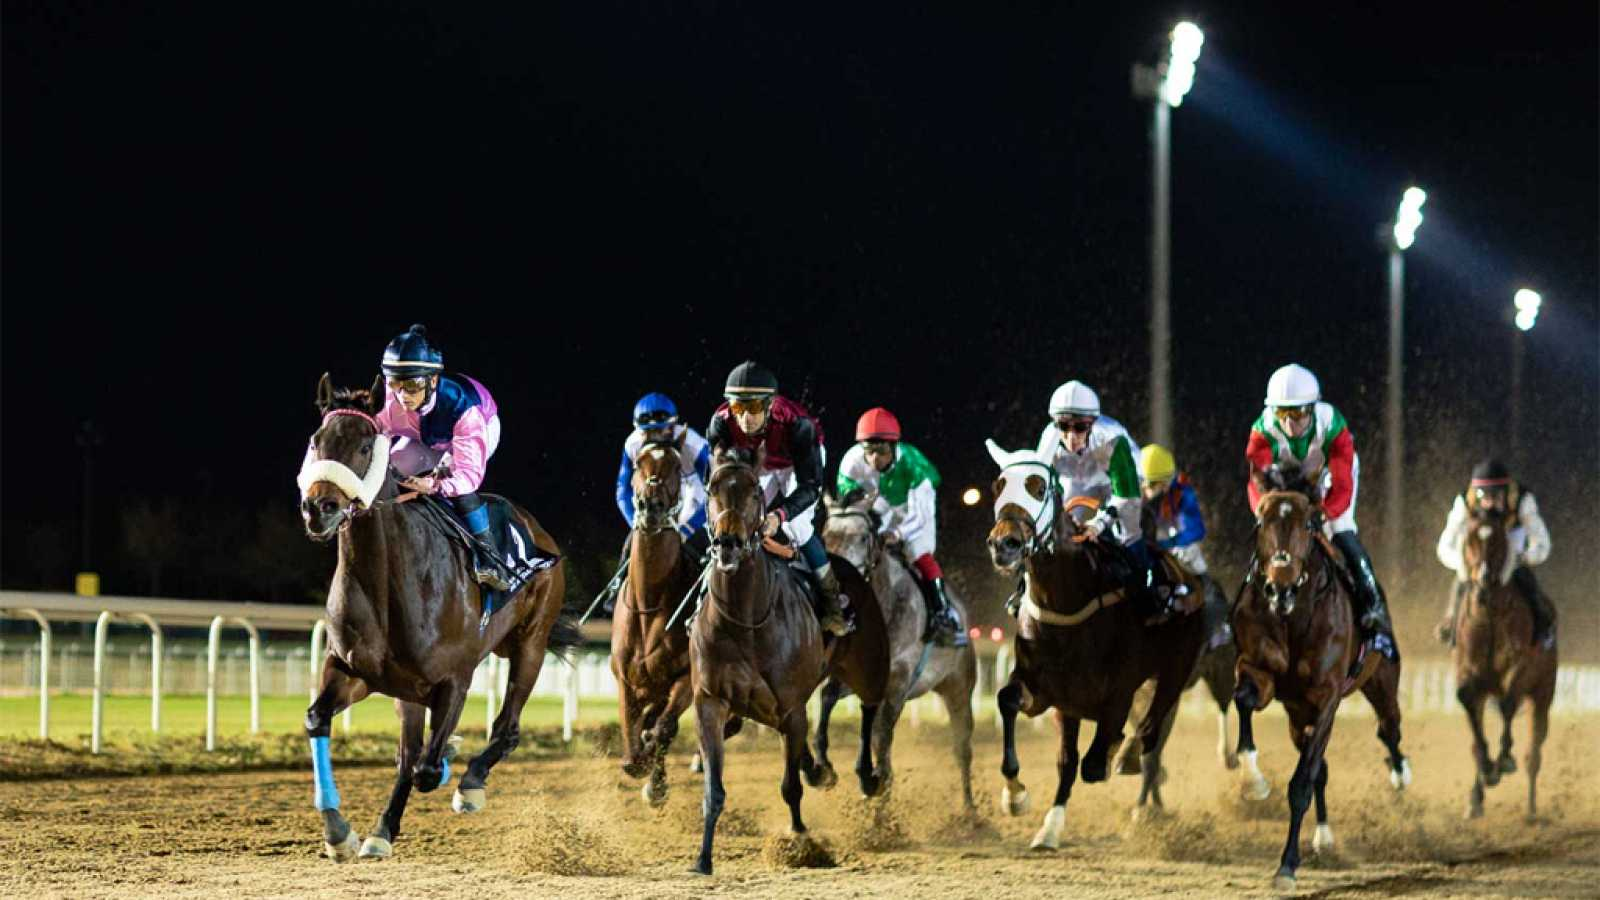 Las carreras de caballos vuelven a RTVE